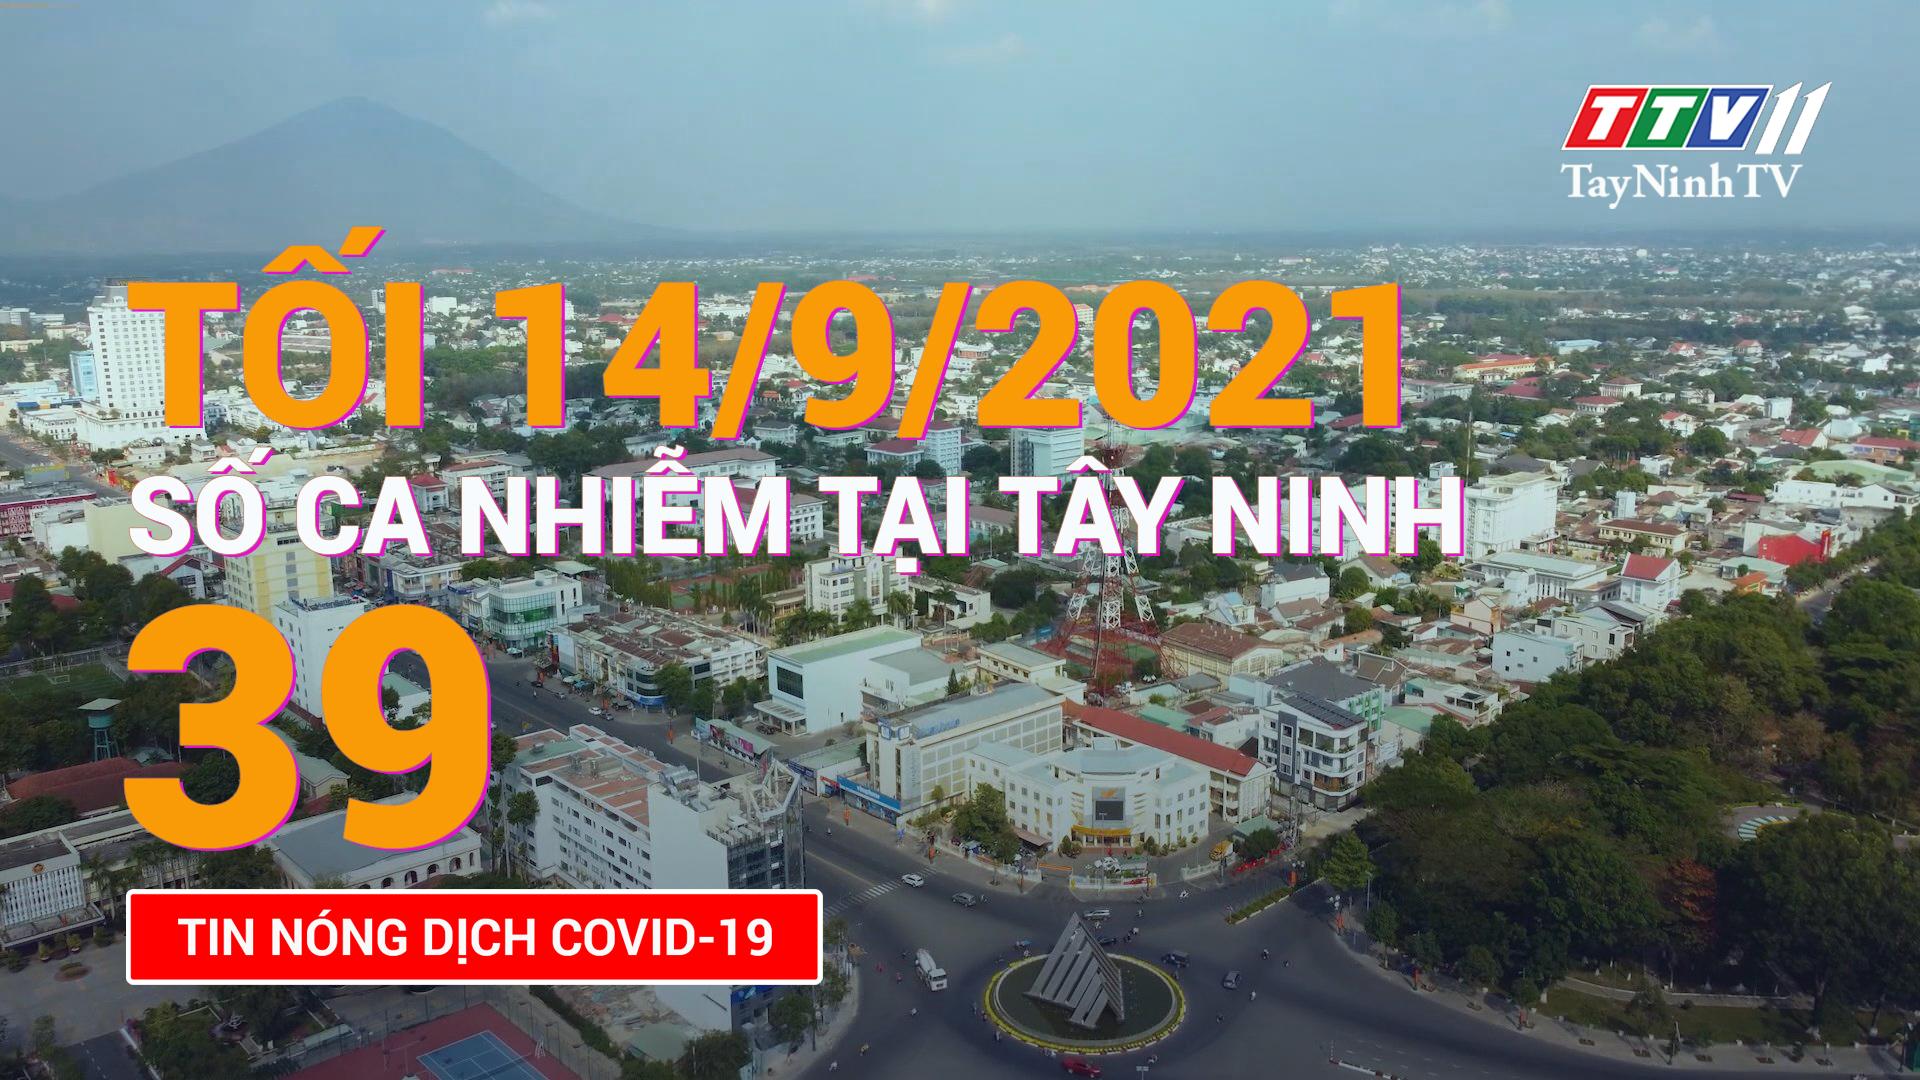 Tin tức Covid-19 tối 14/9/2021 | TayNinhTV